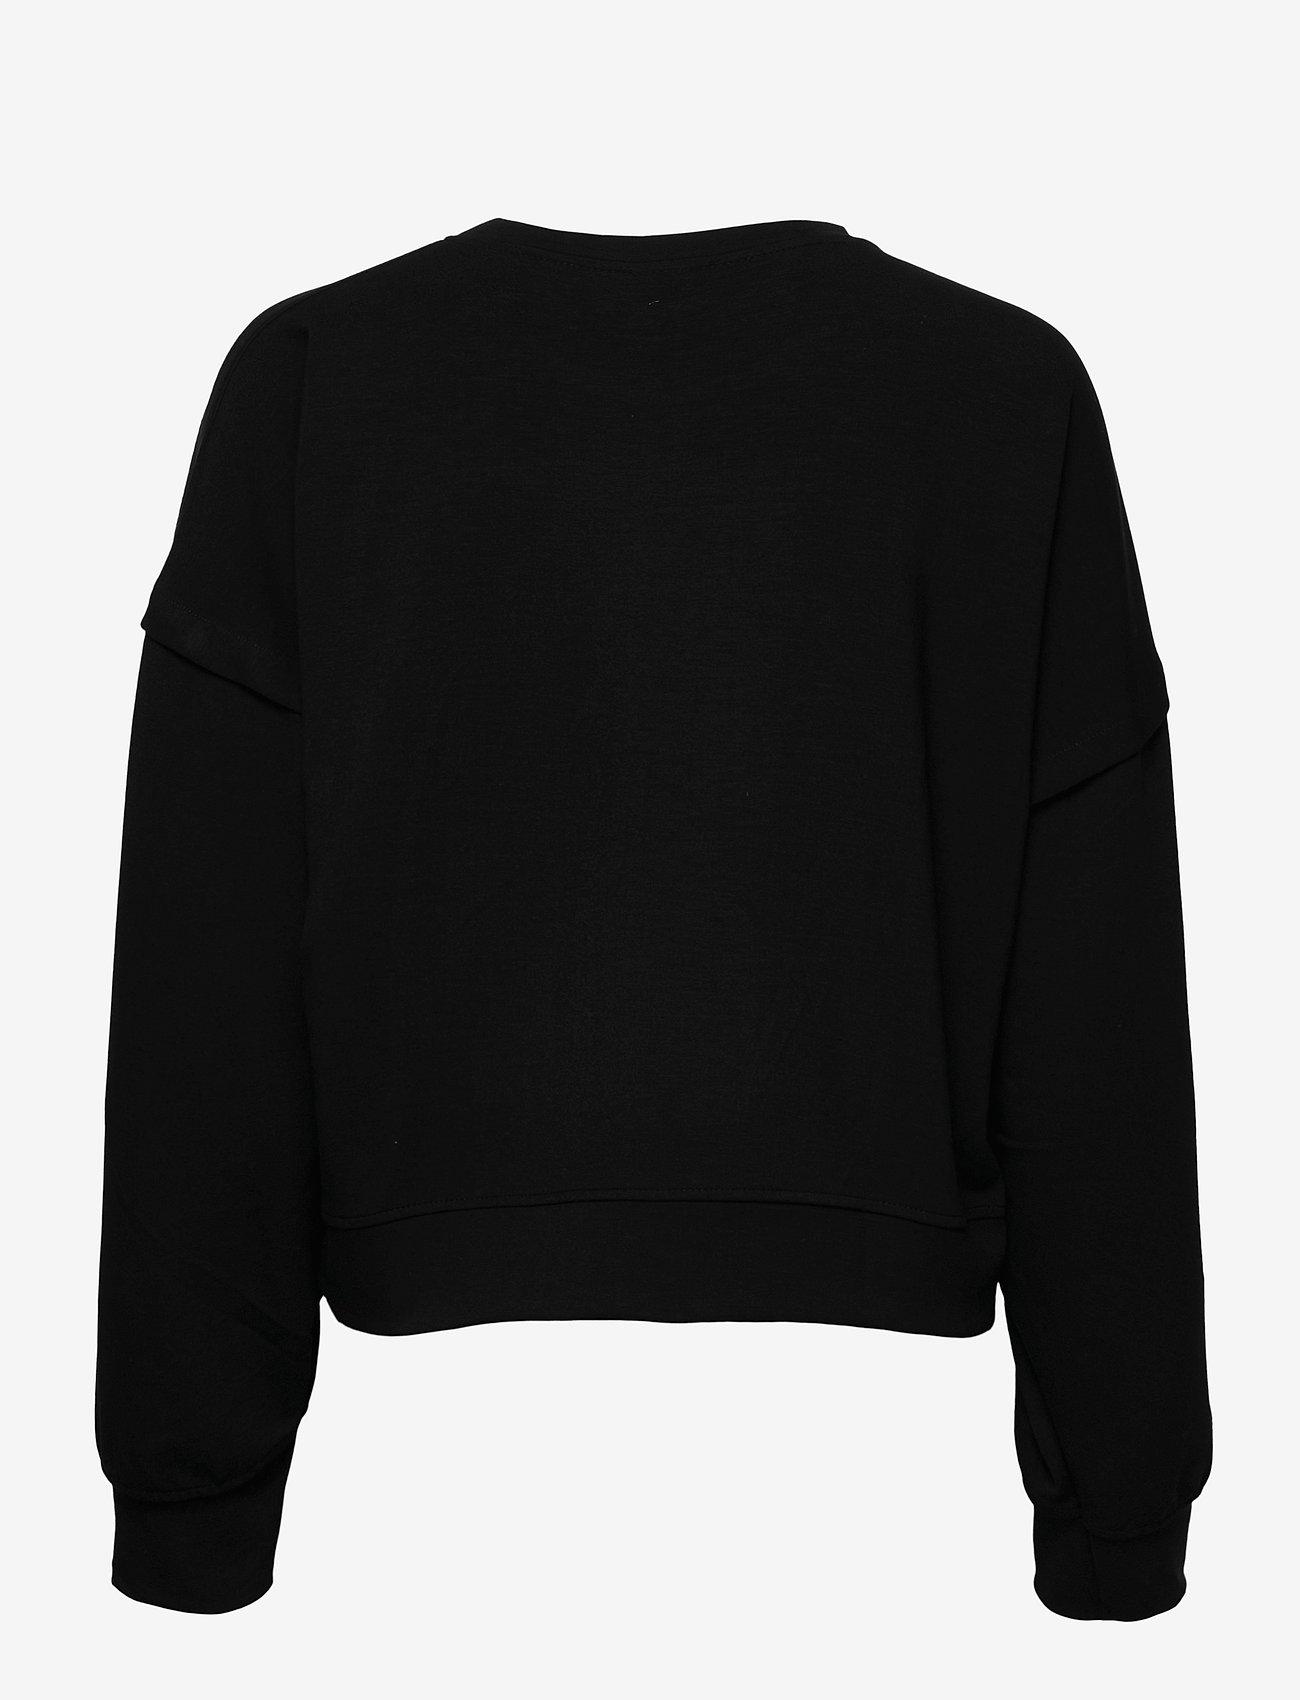 Gestuz - ChrisdaGZ sweatshirt - sweatshirts - black - 1